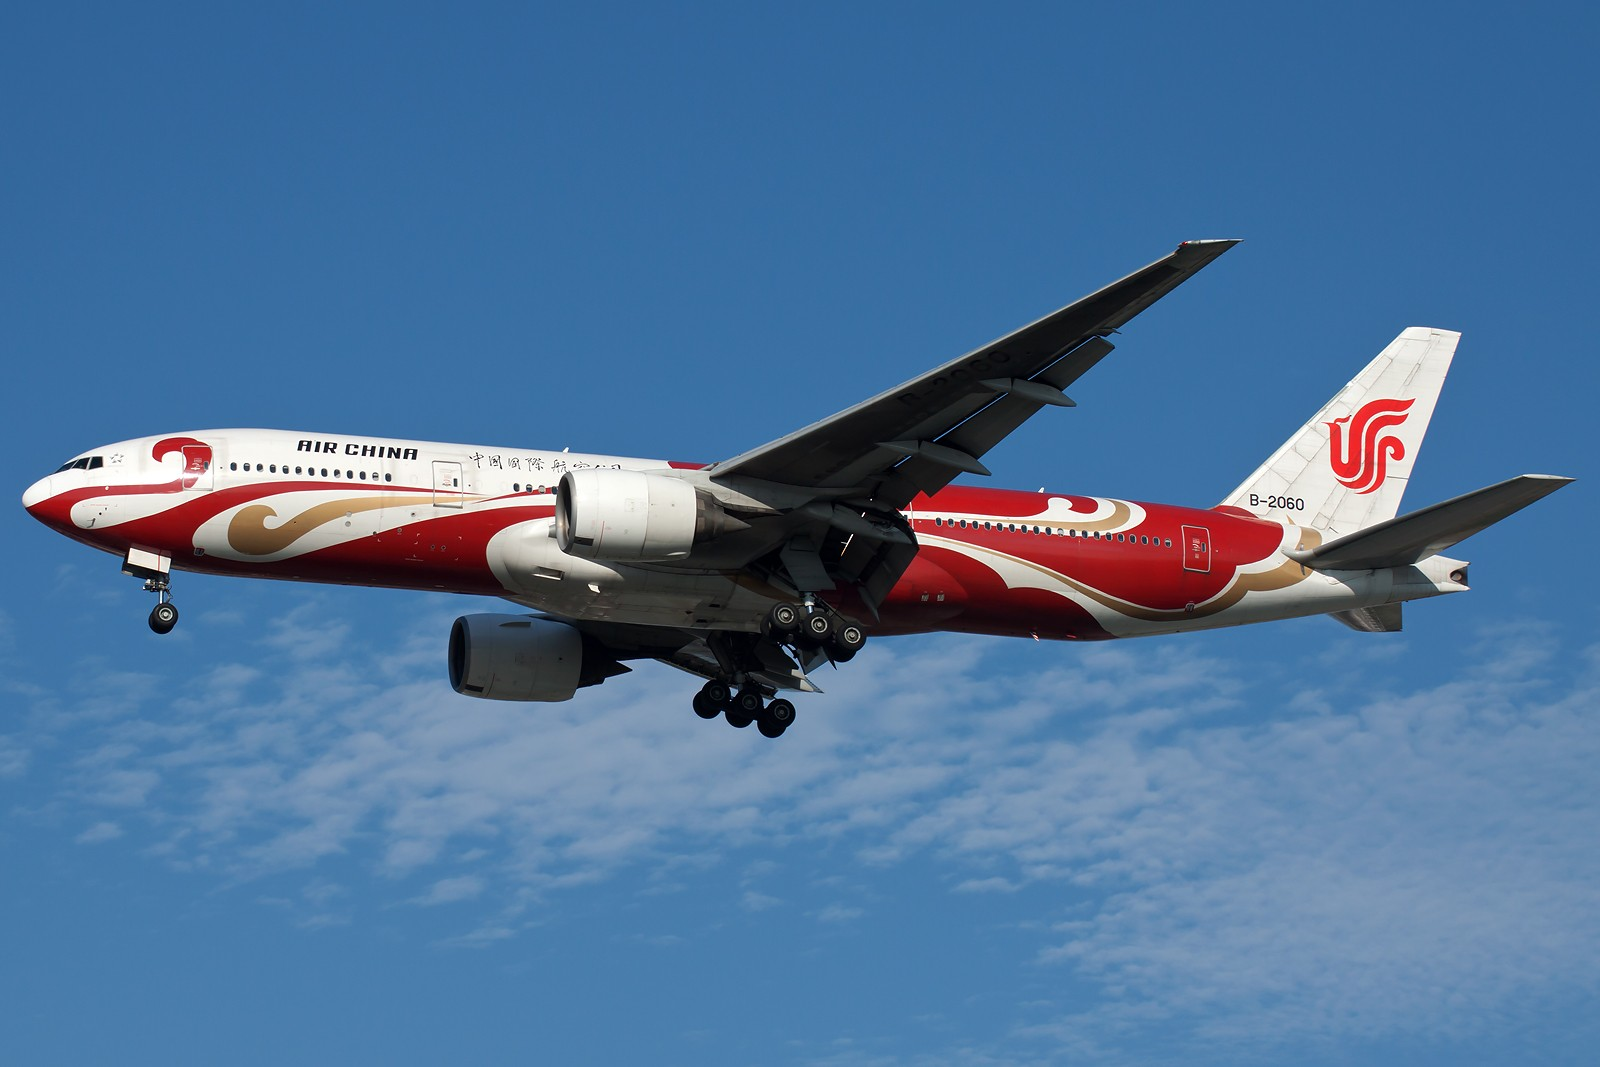 Re:[原创]再来10张 BOEING 777-200 B-2060 中国北京首都国际机场